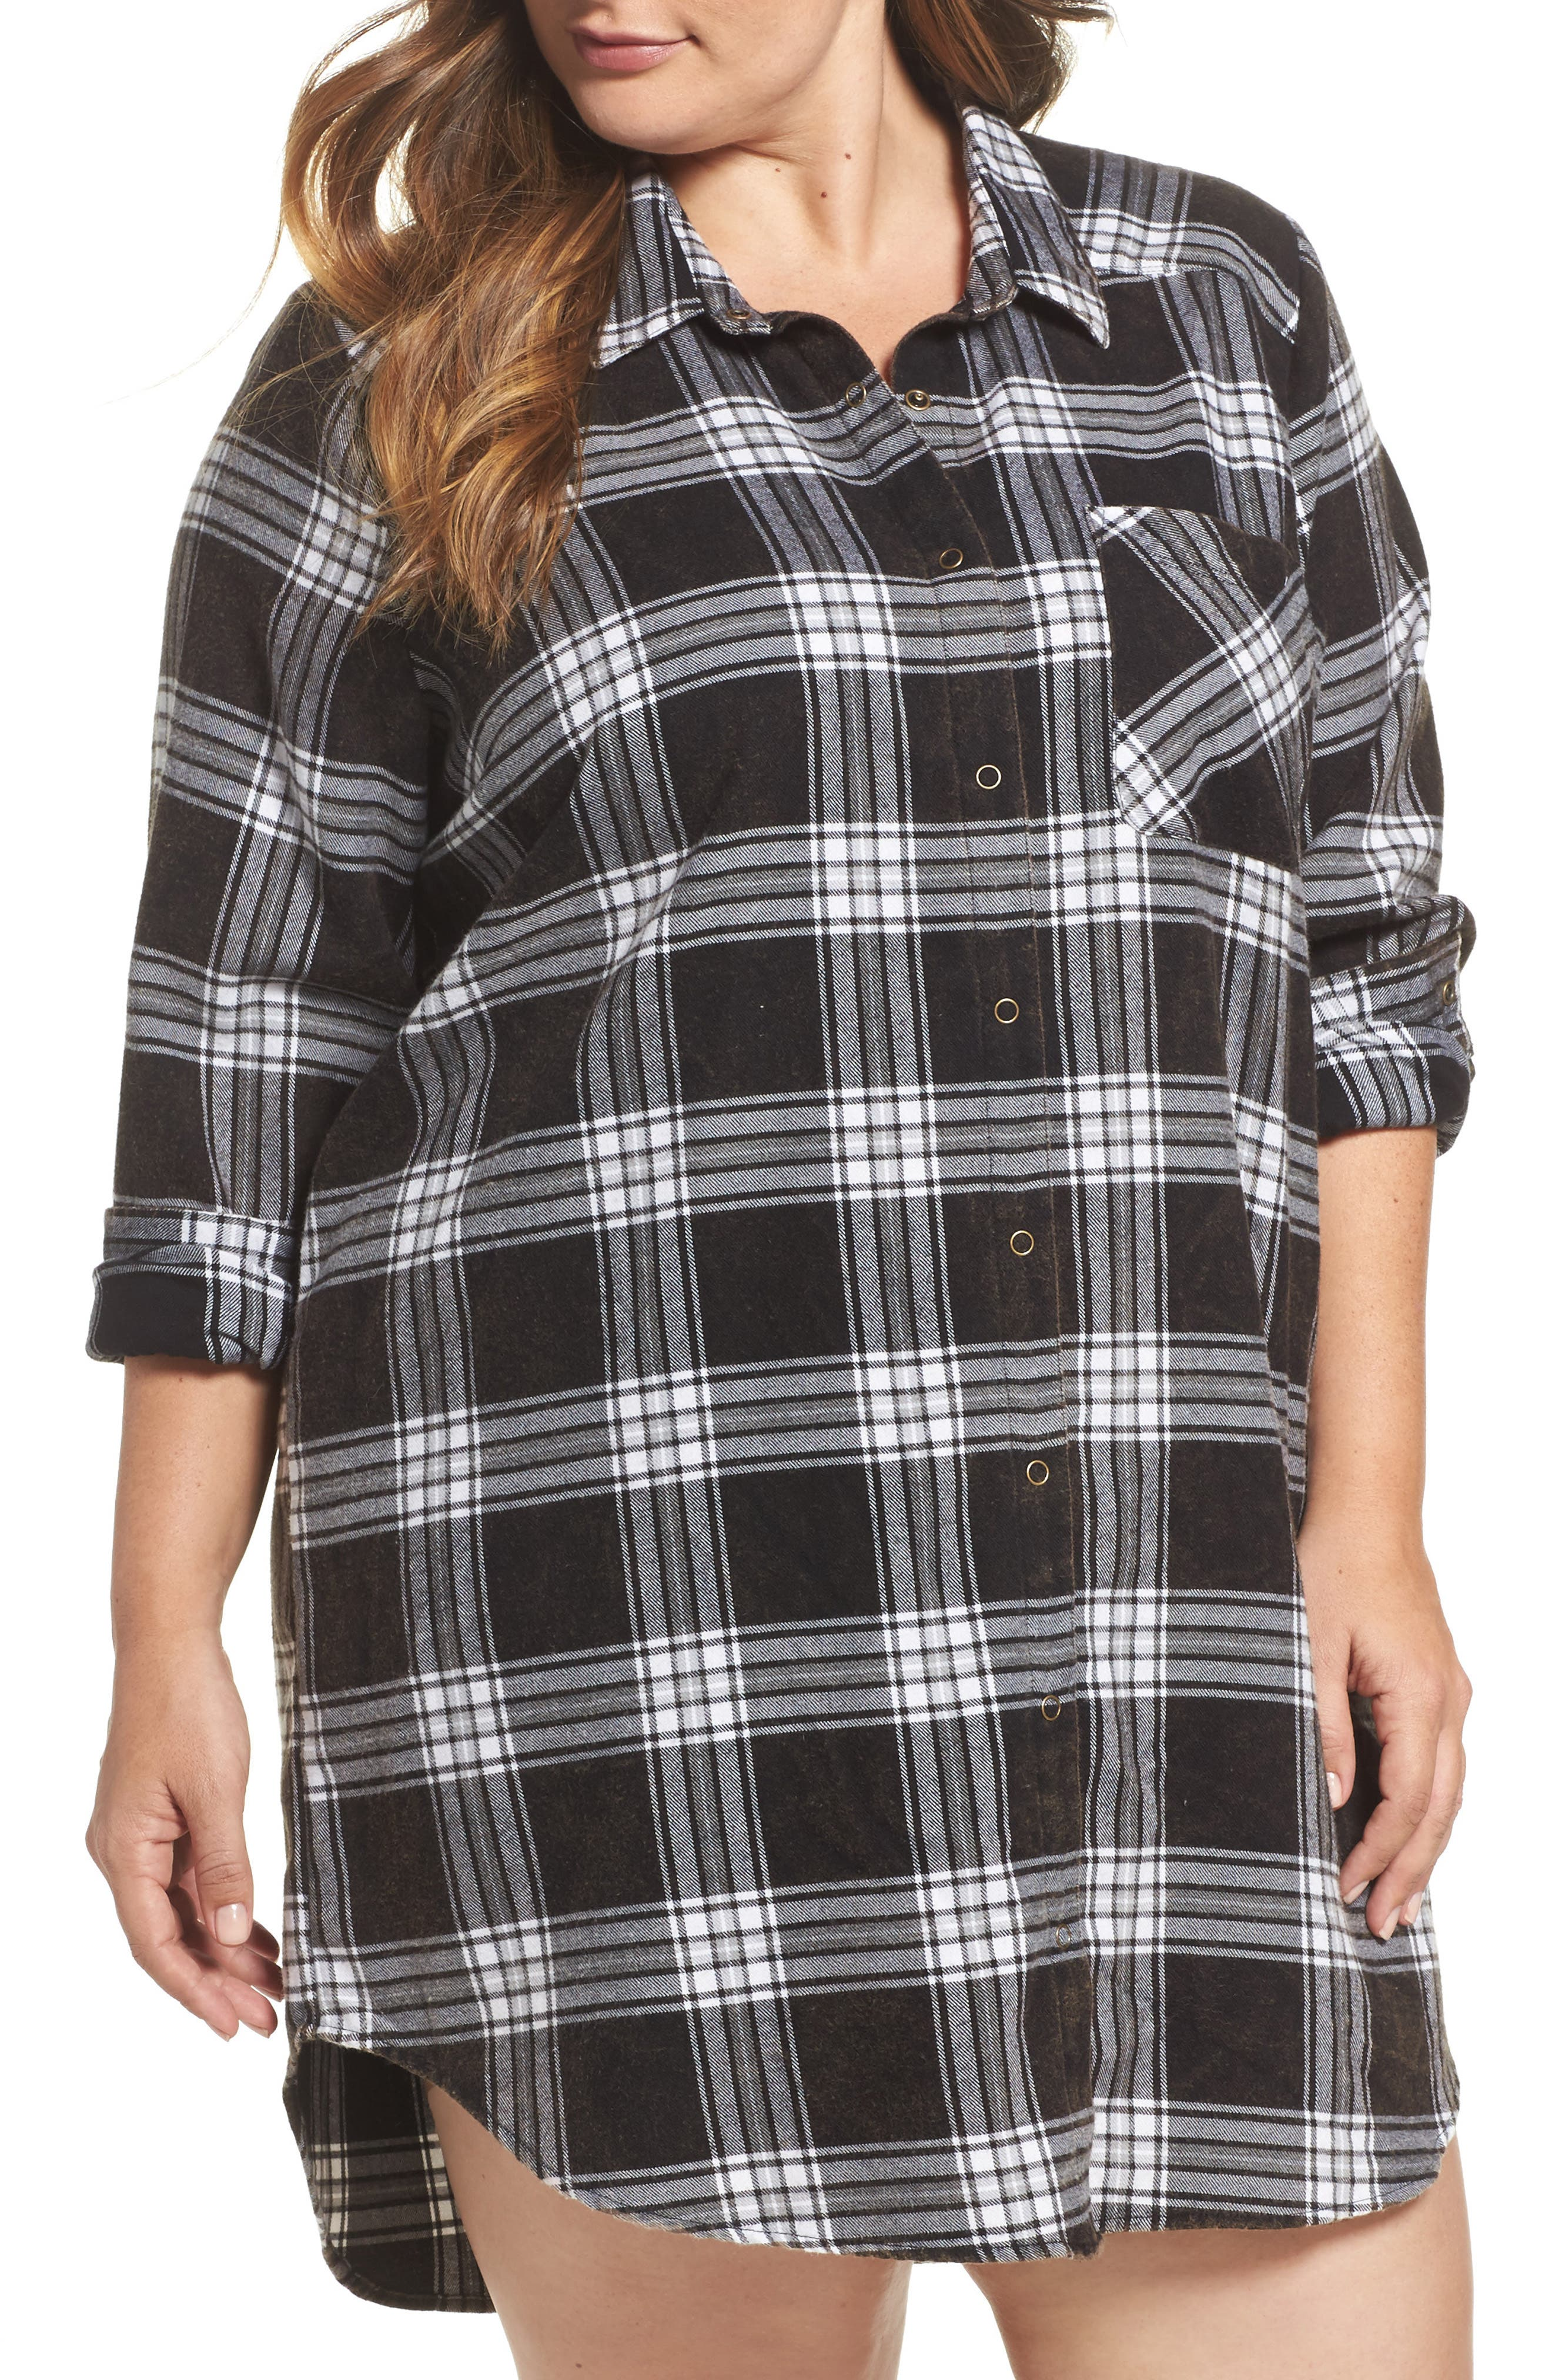 Main Image - Make + Model Plaid Cotton Blend Nightshirt (Plus Size)